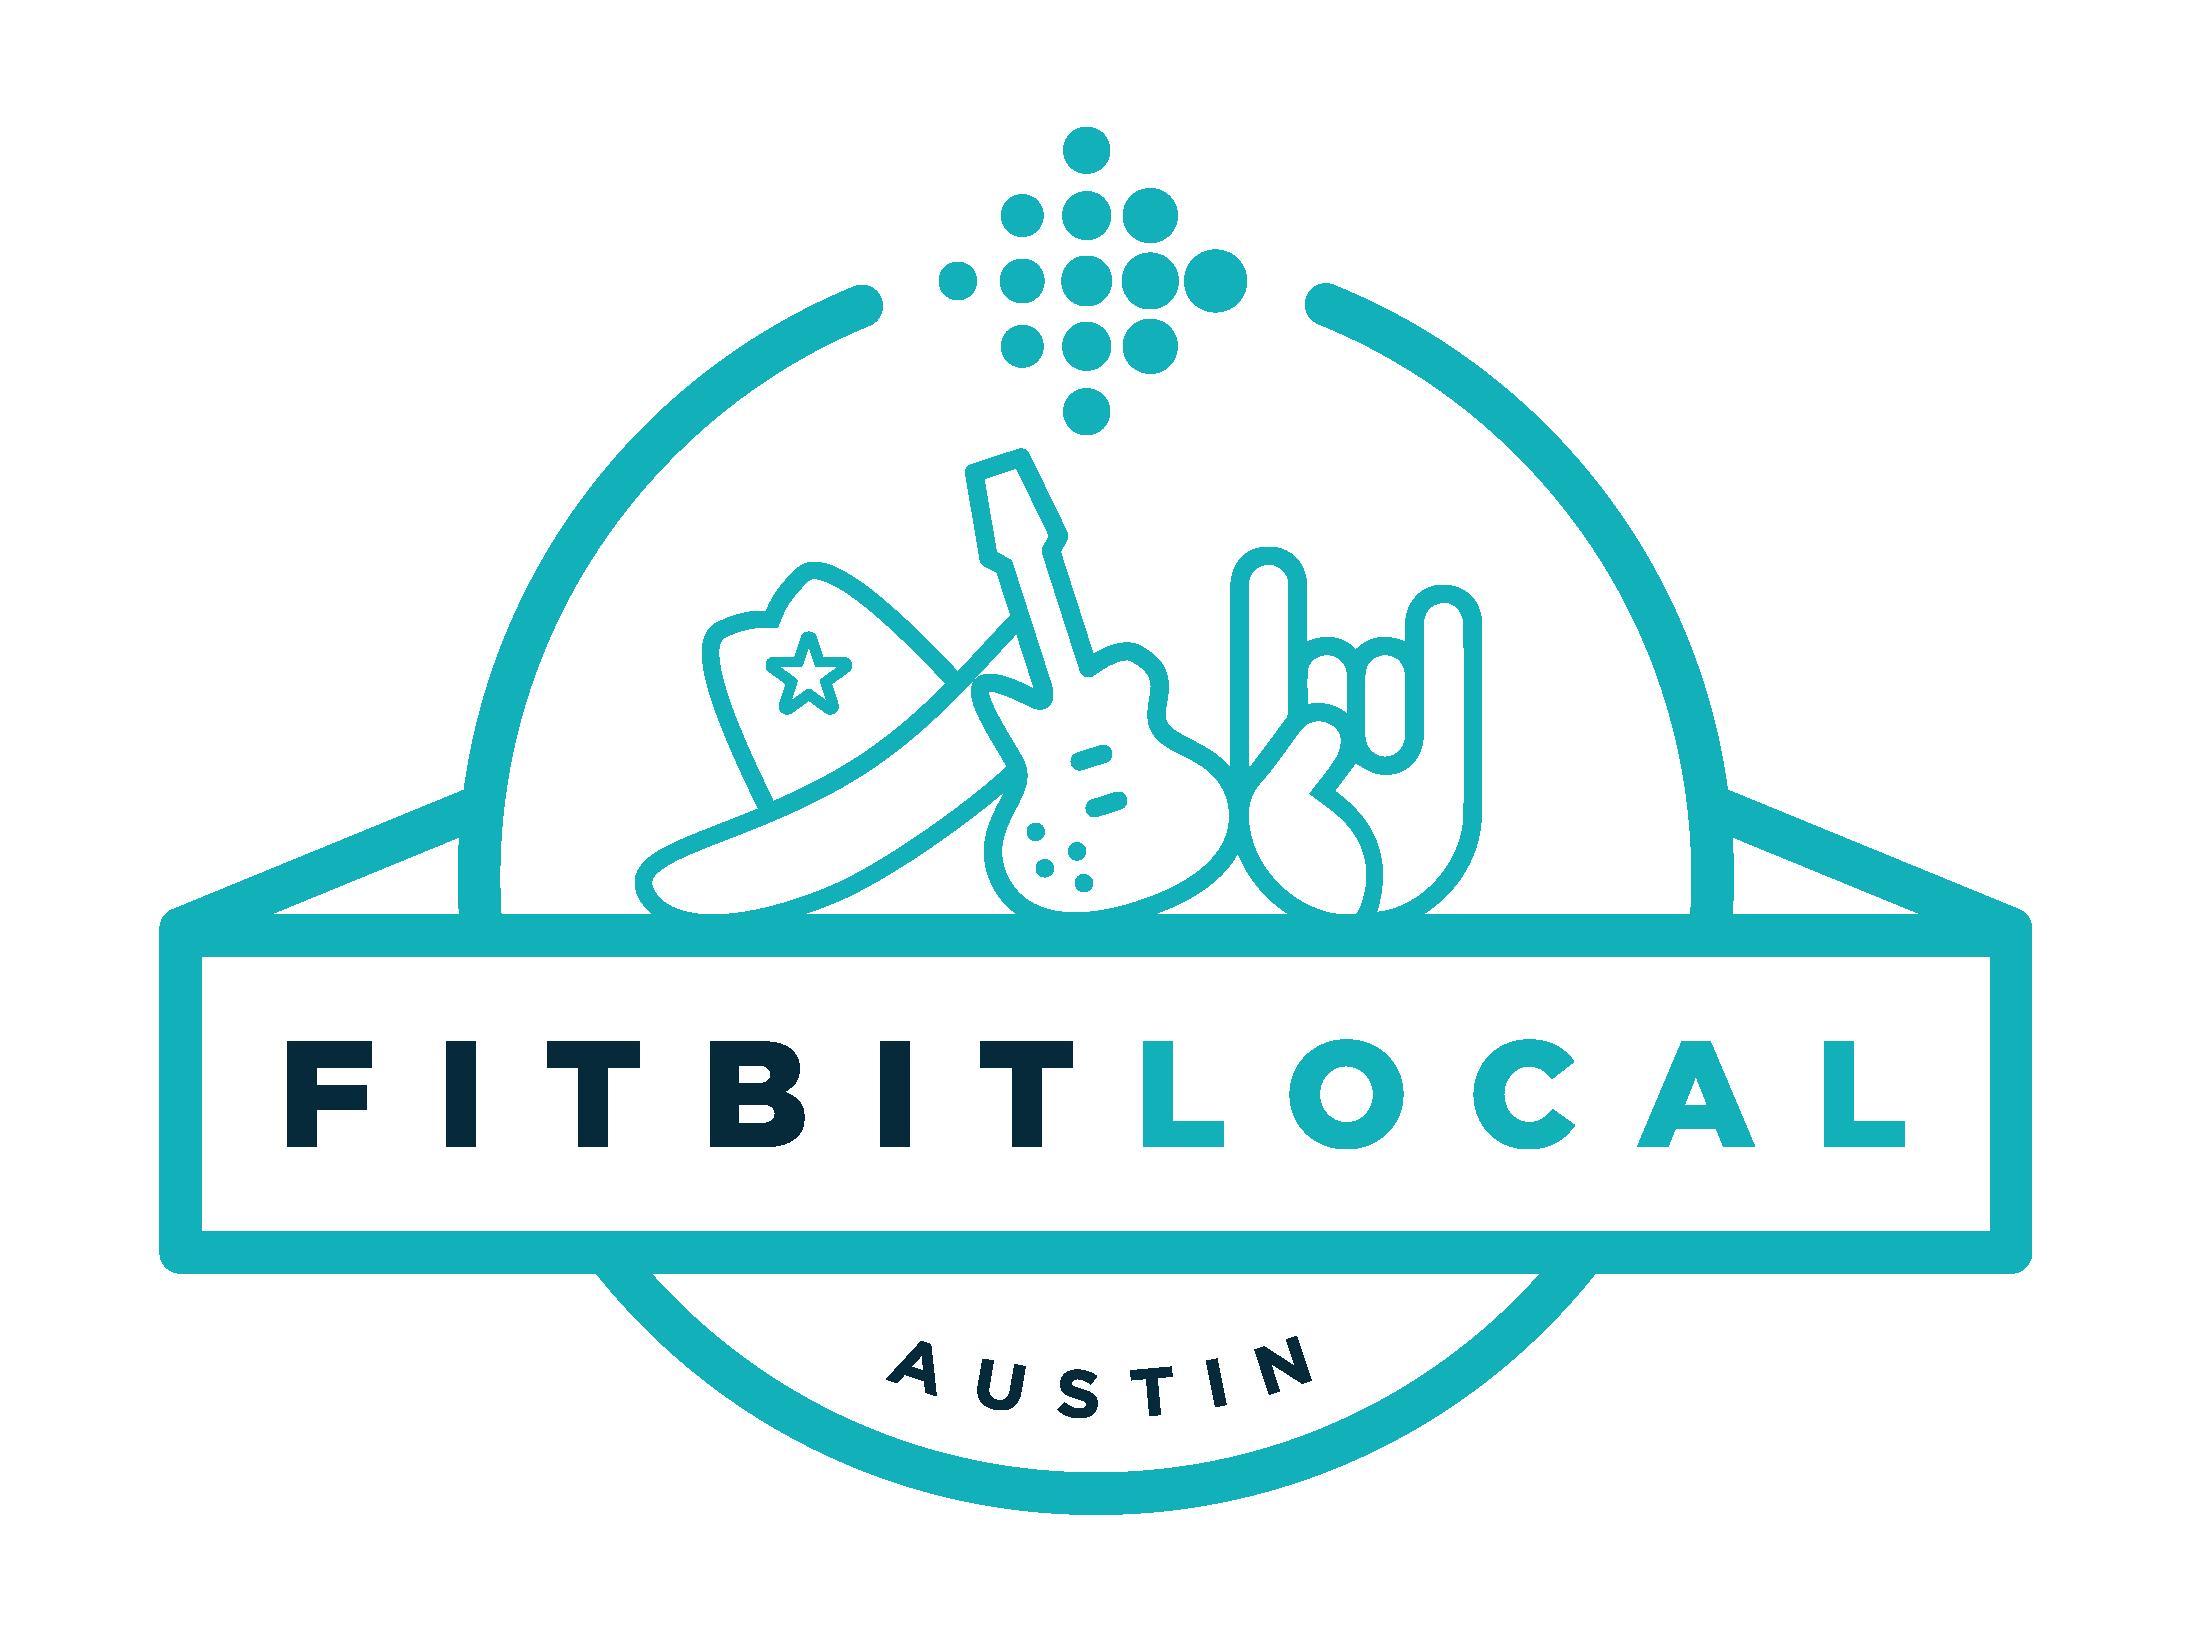 Fitbit Local Austin